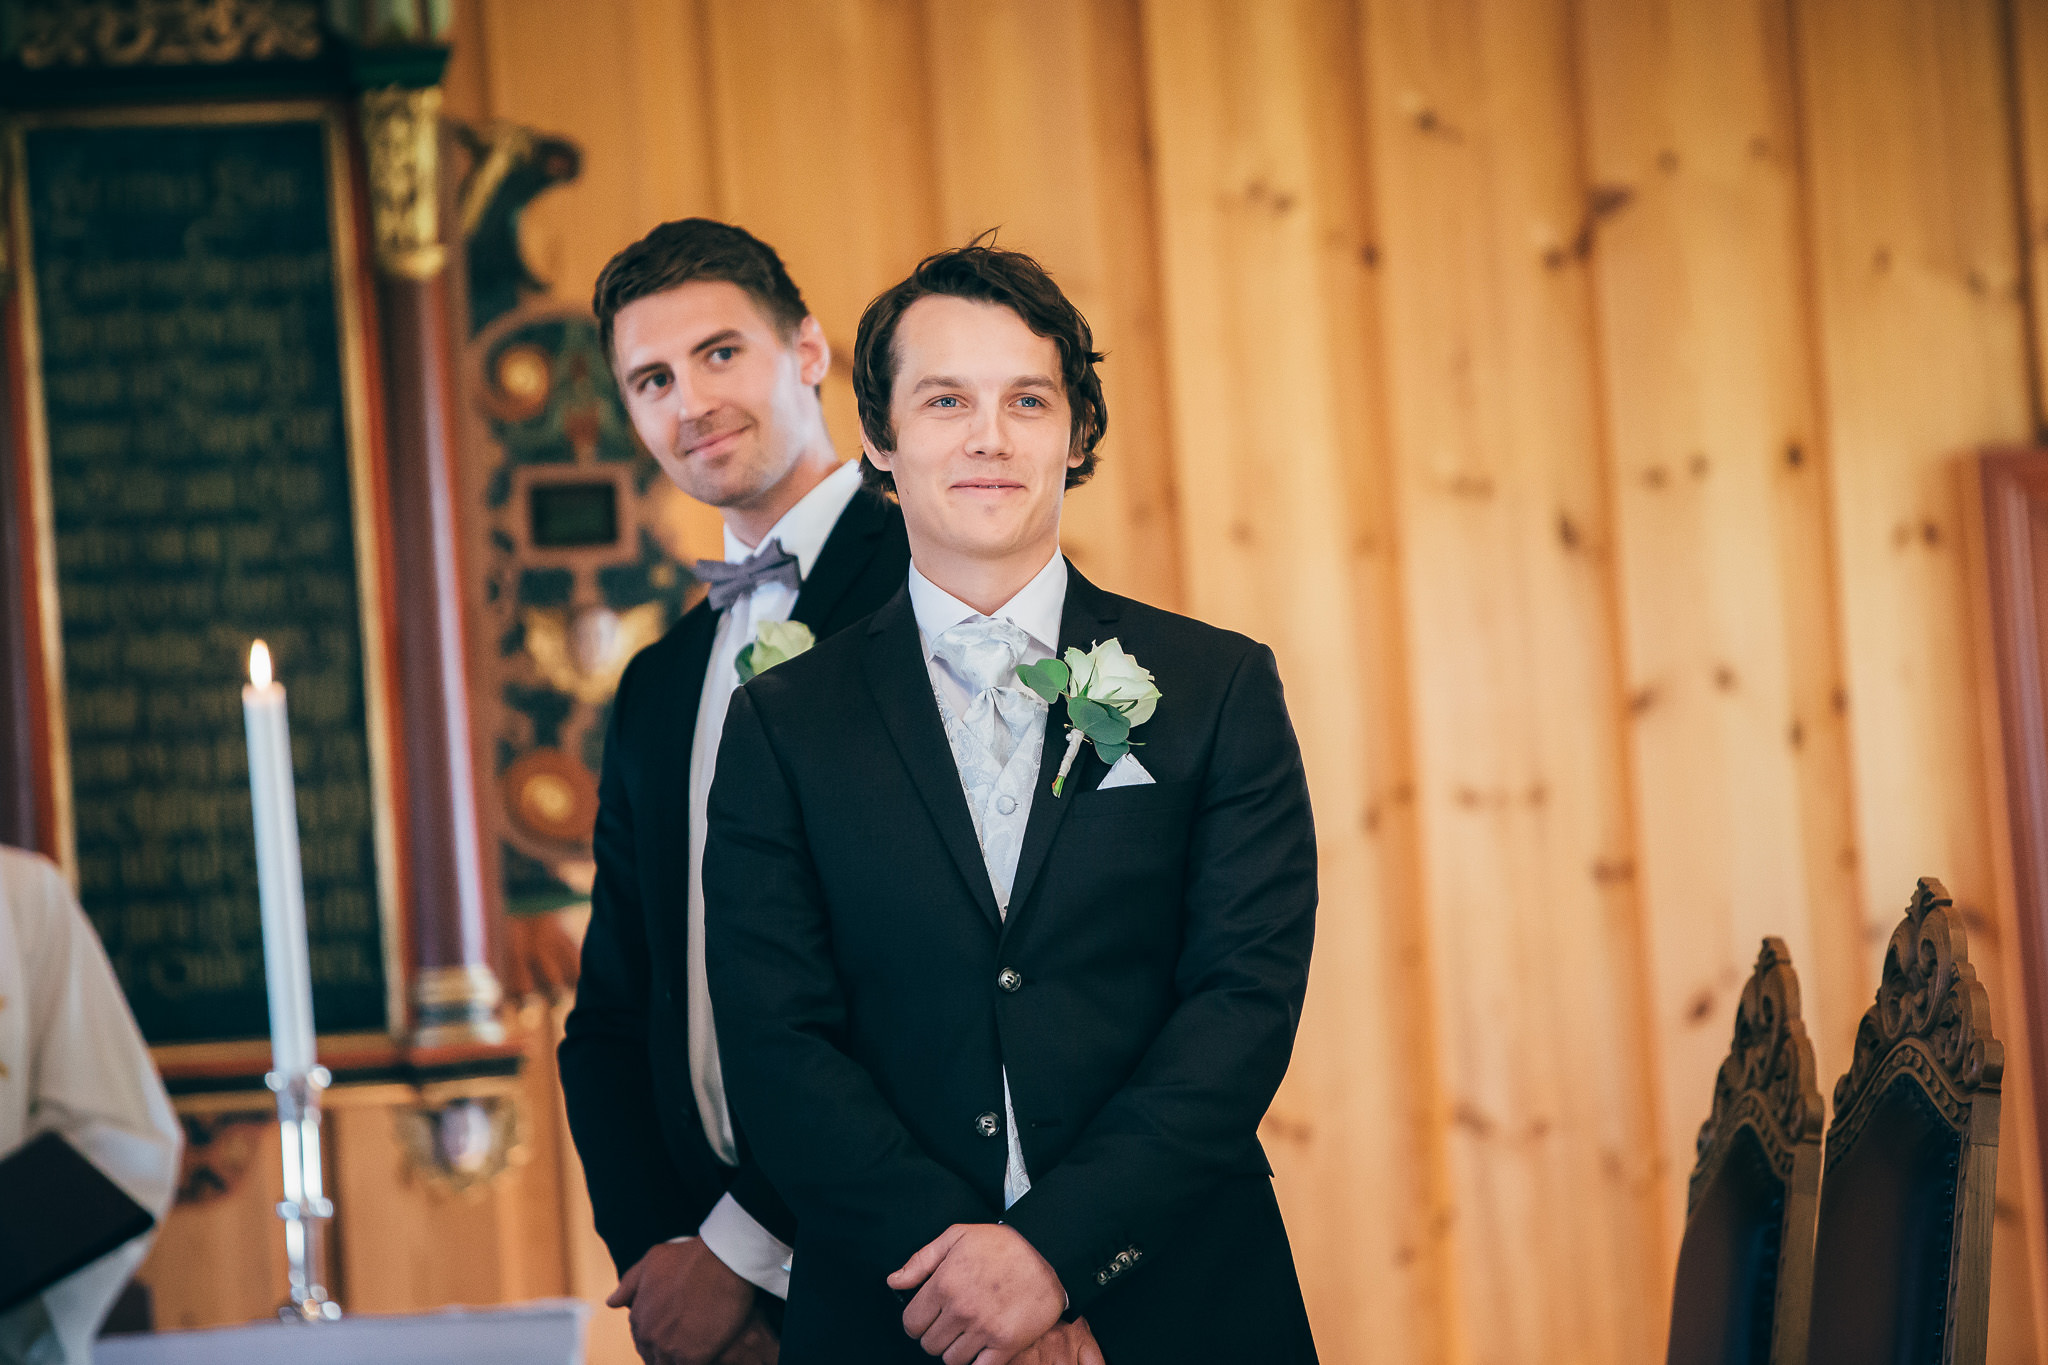 Wedding+Photographer+Norway+Bryllupsfotograf+Casey+Arneson+JT-35.jpg